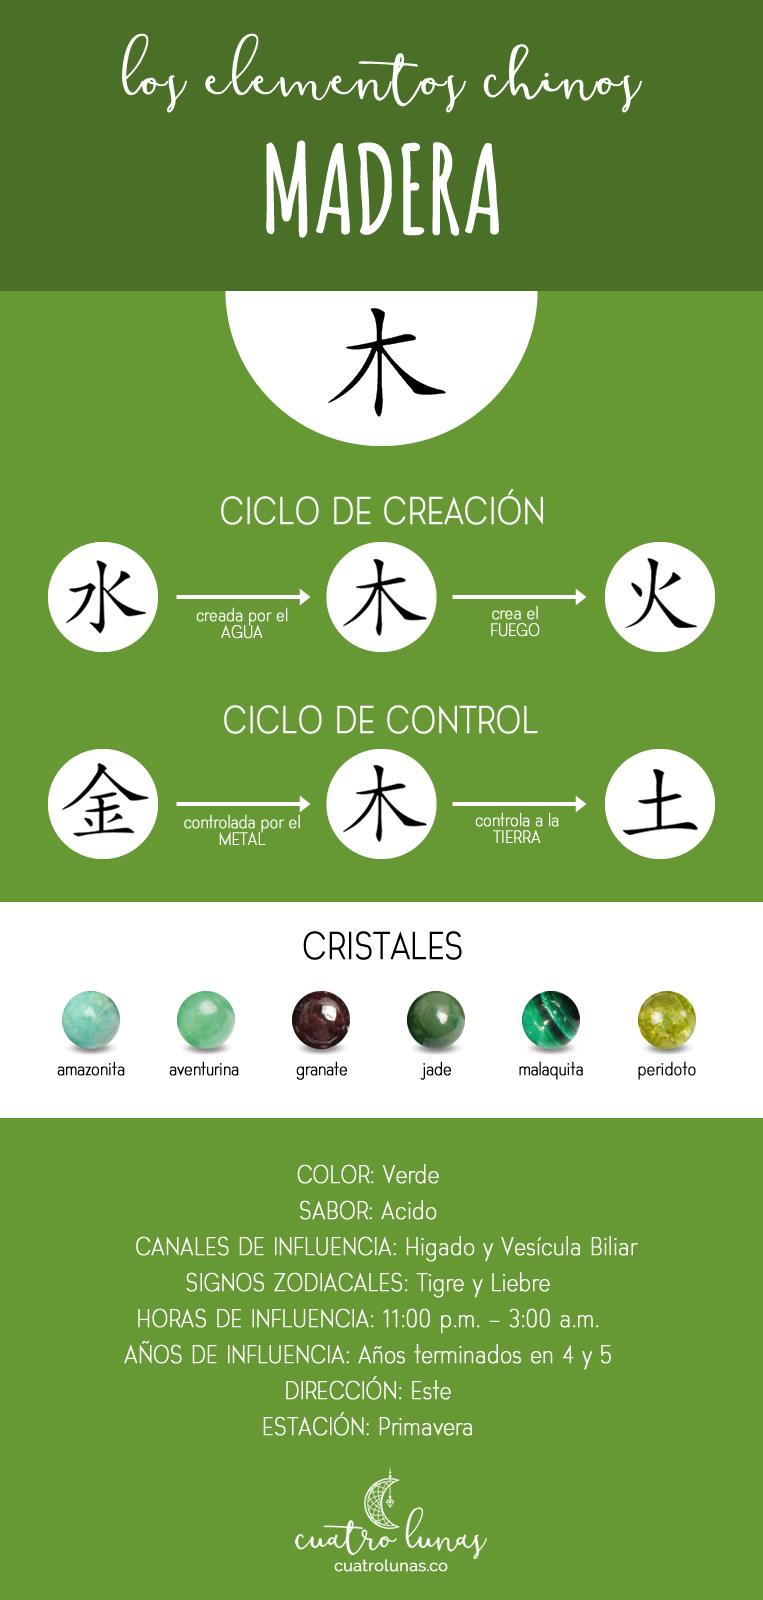 elemento chino madera